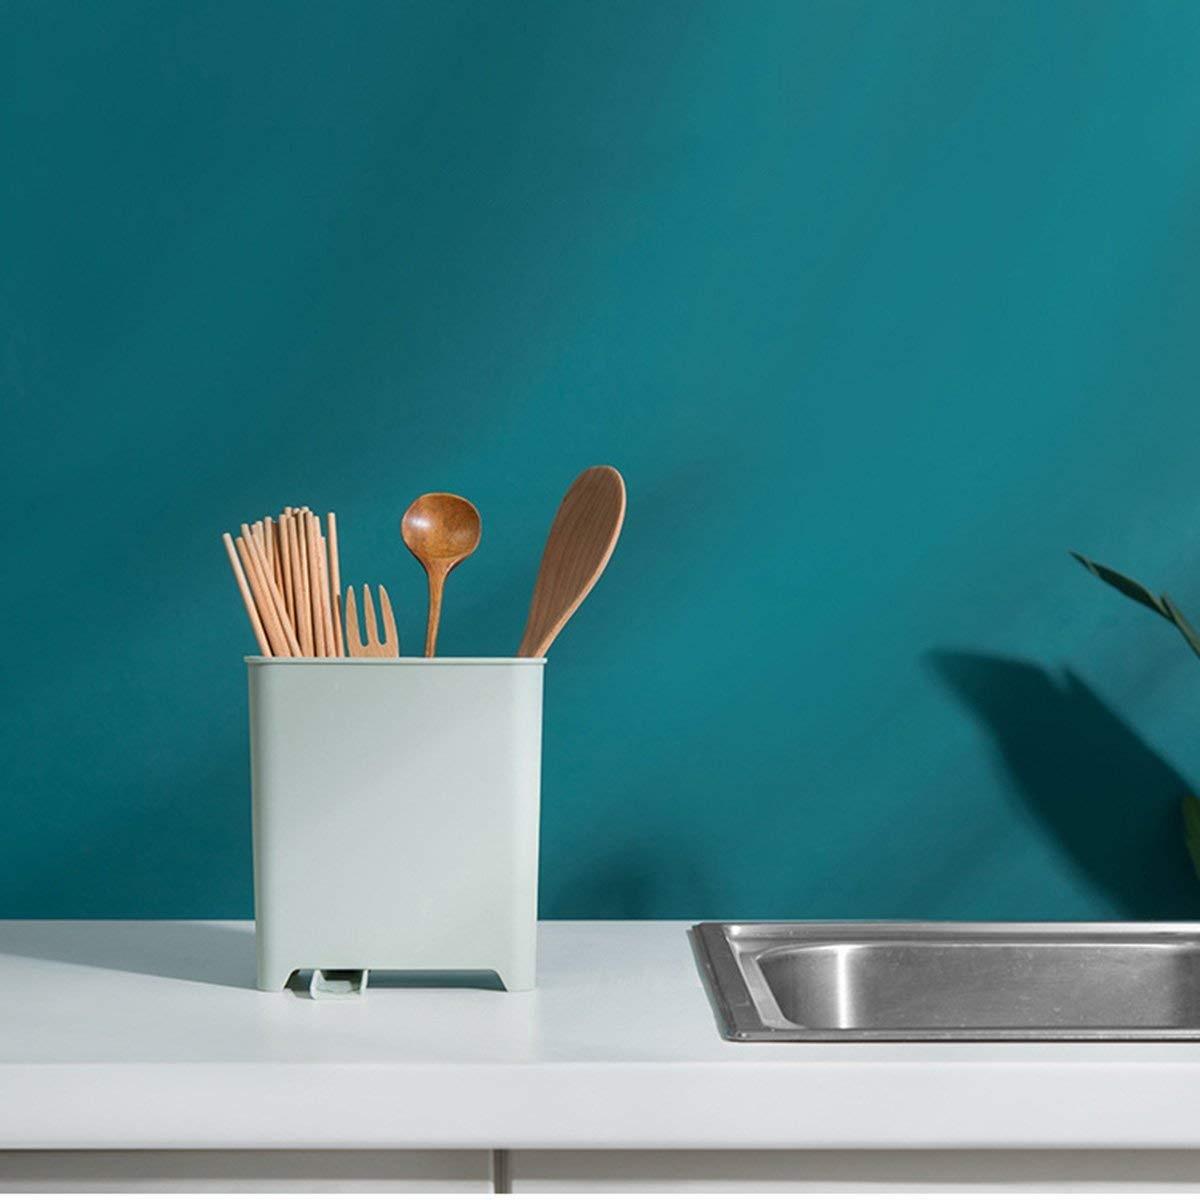 Crockery Organiser Kitchen: Buy Online from Fishpond.com.au